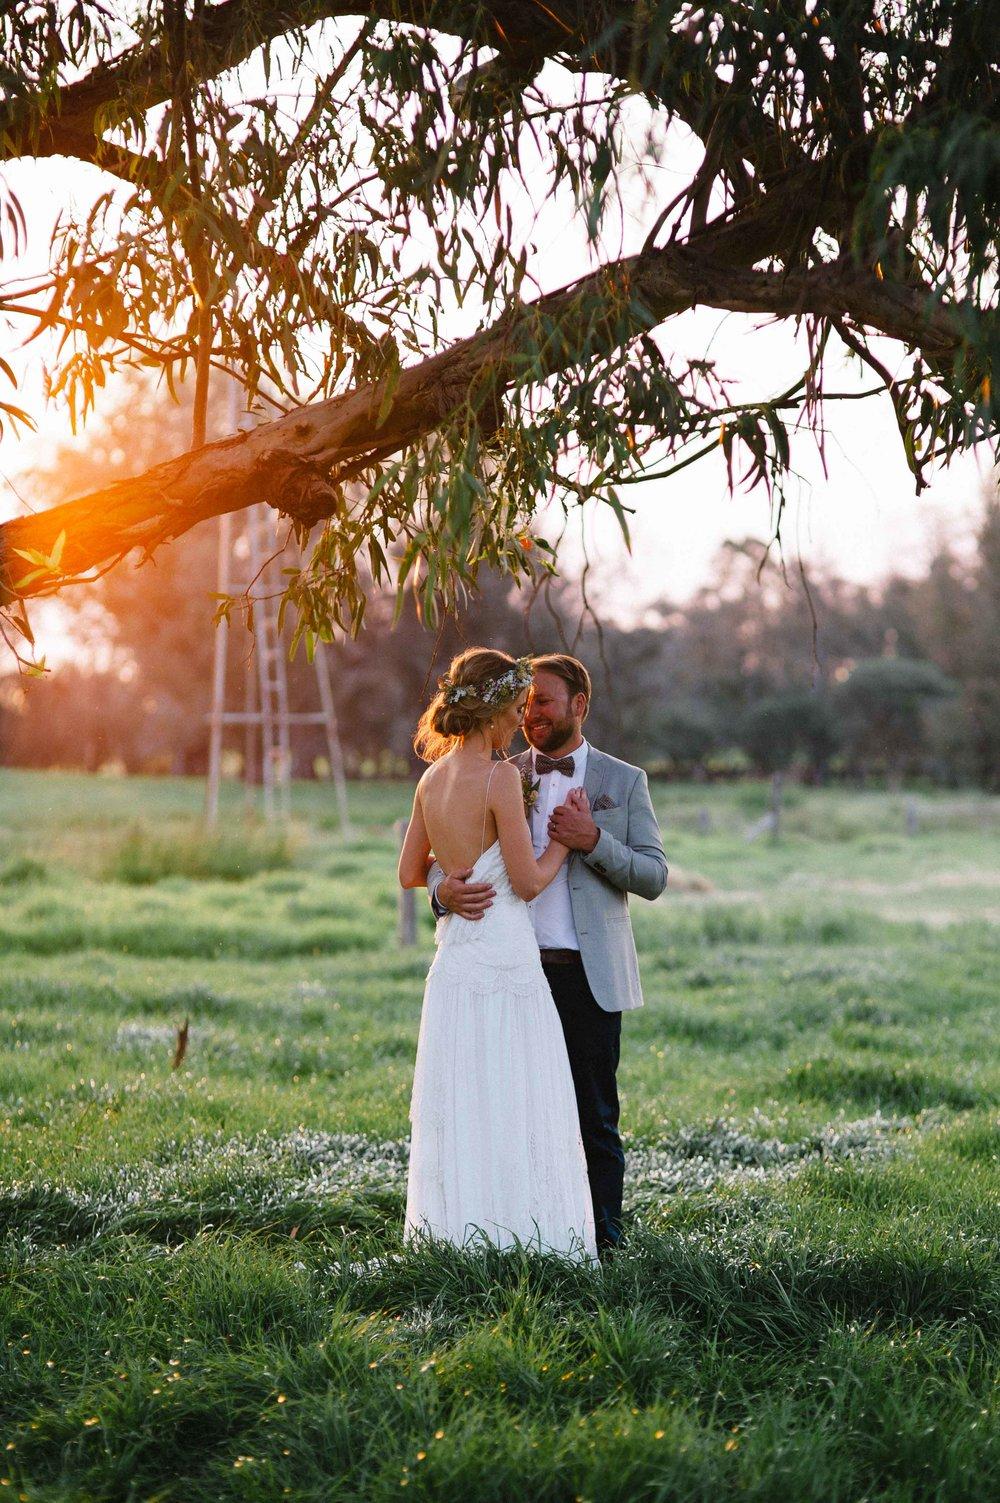 67-romantic sunset wedding photography rustic perth.jpg